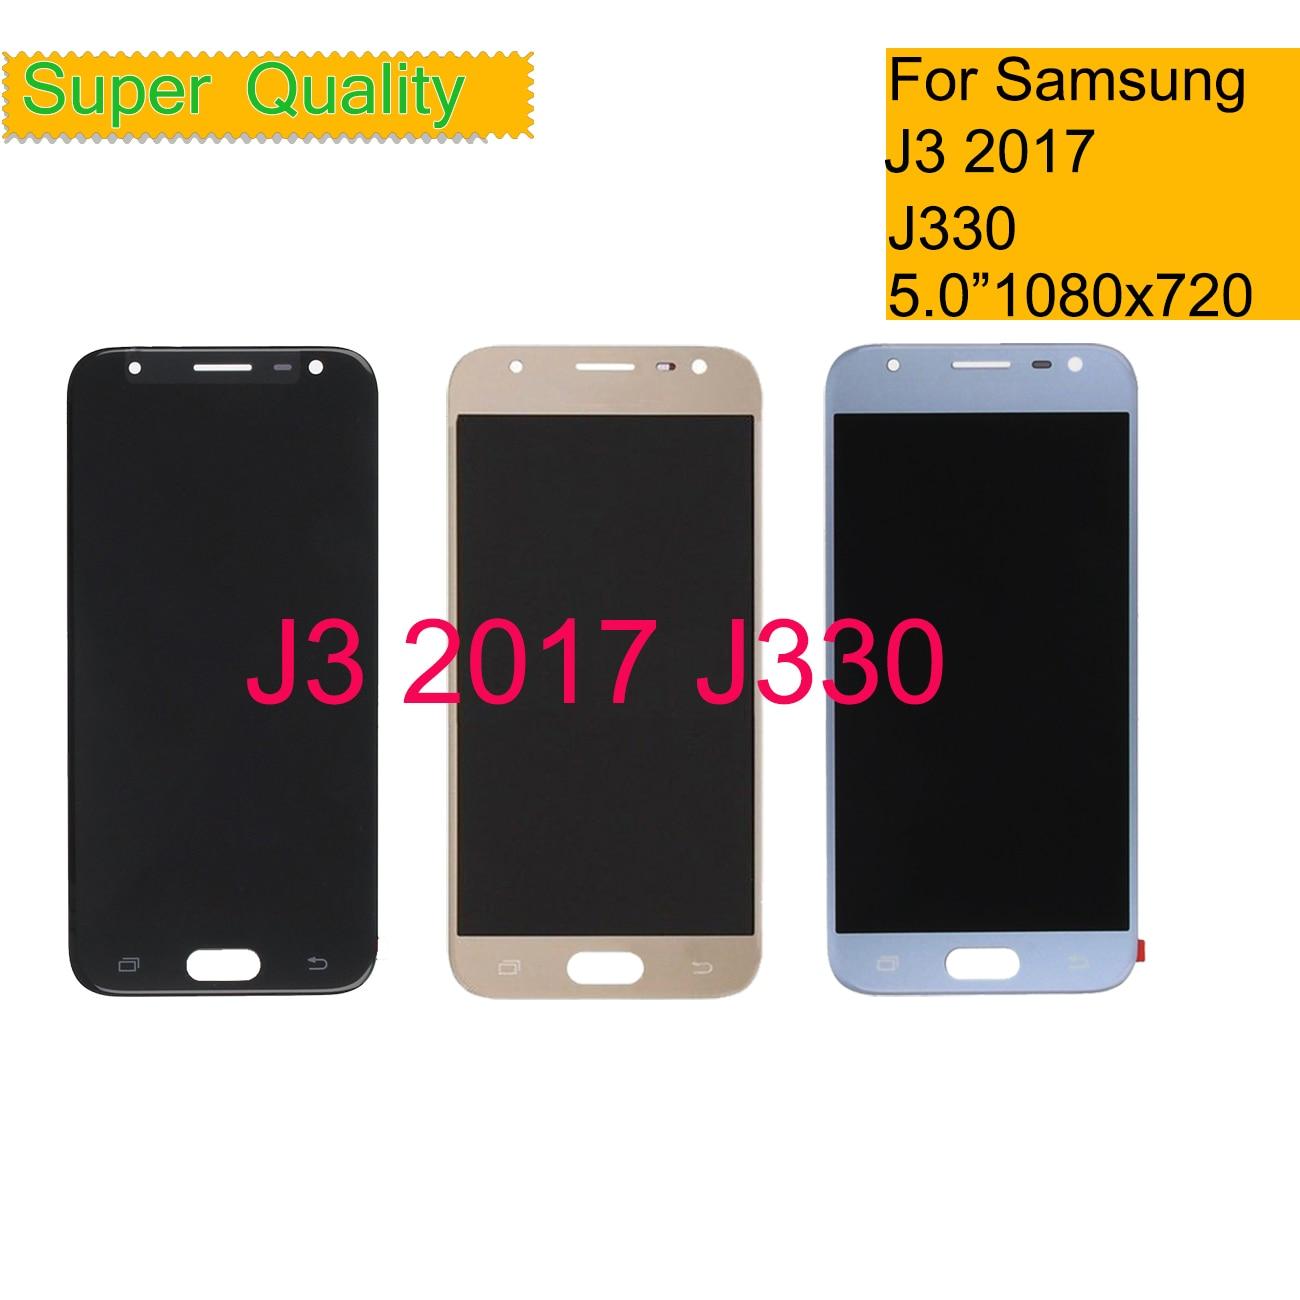 10 unids/lote para Samsung Galaxy J3 2017 j330 J330F teléfono pantalla LCD MONTAJE DE digitalizador con pantalla táctil con Control de brillo